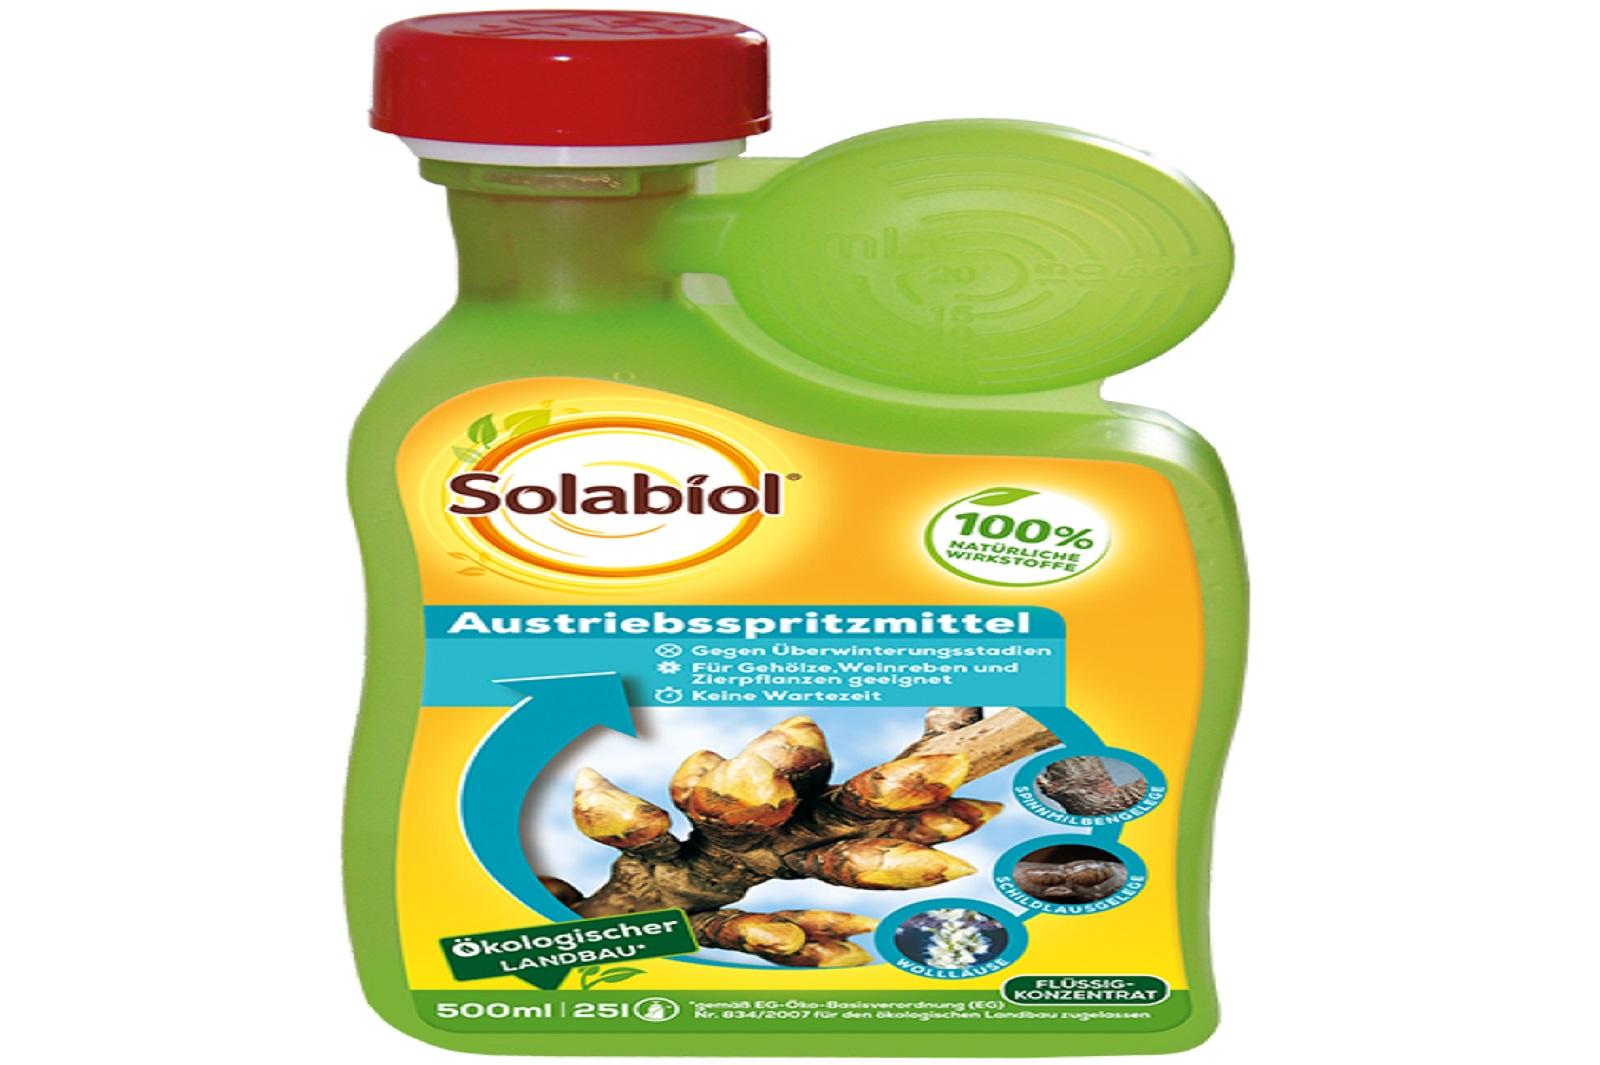 Solabiol Austriebsspritzmittel 500 ml